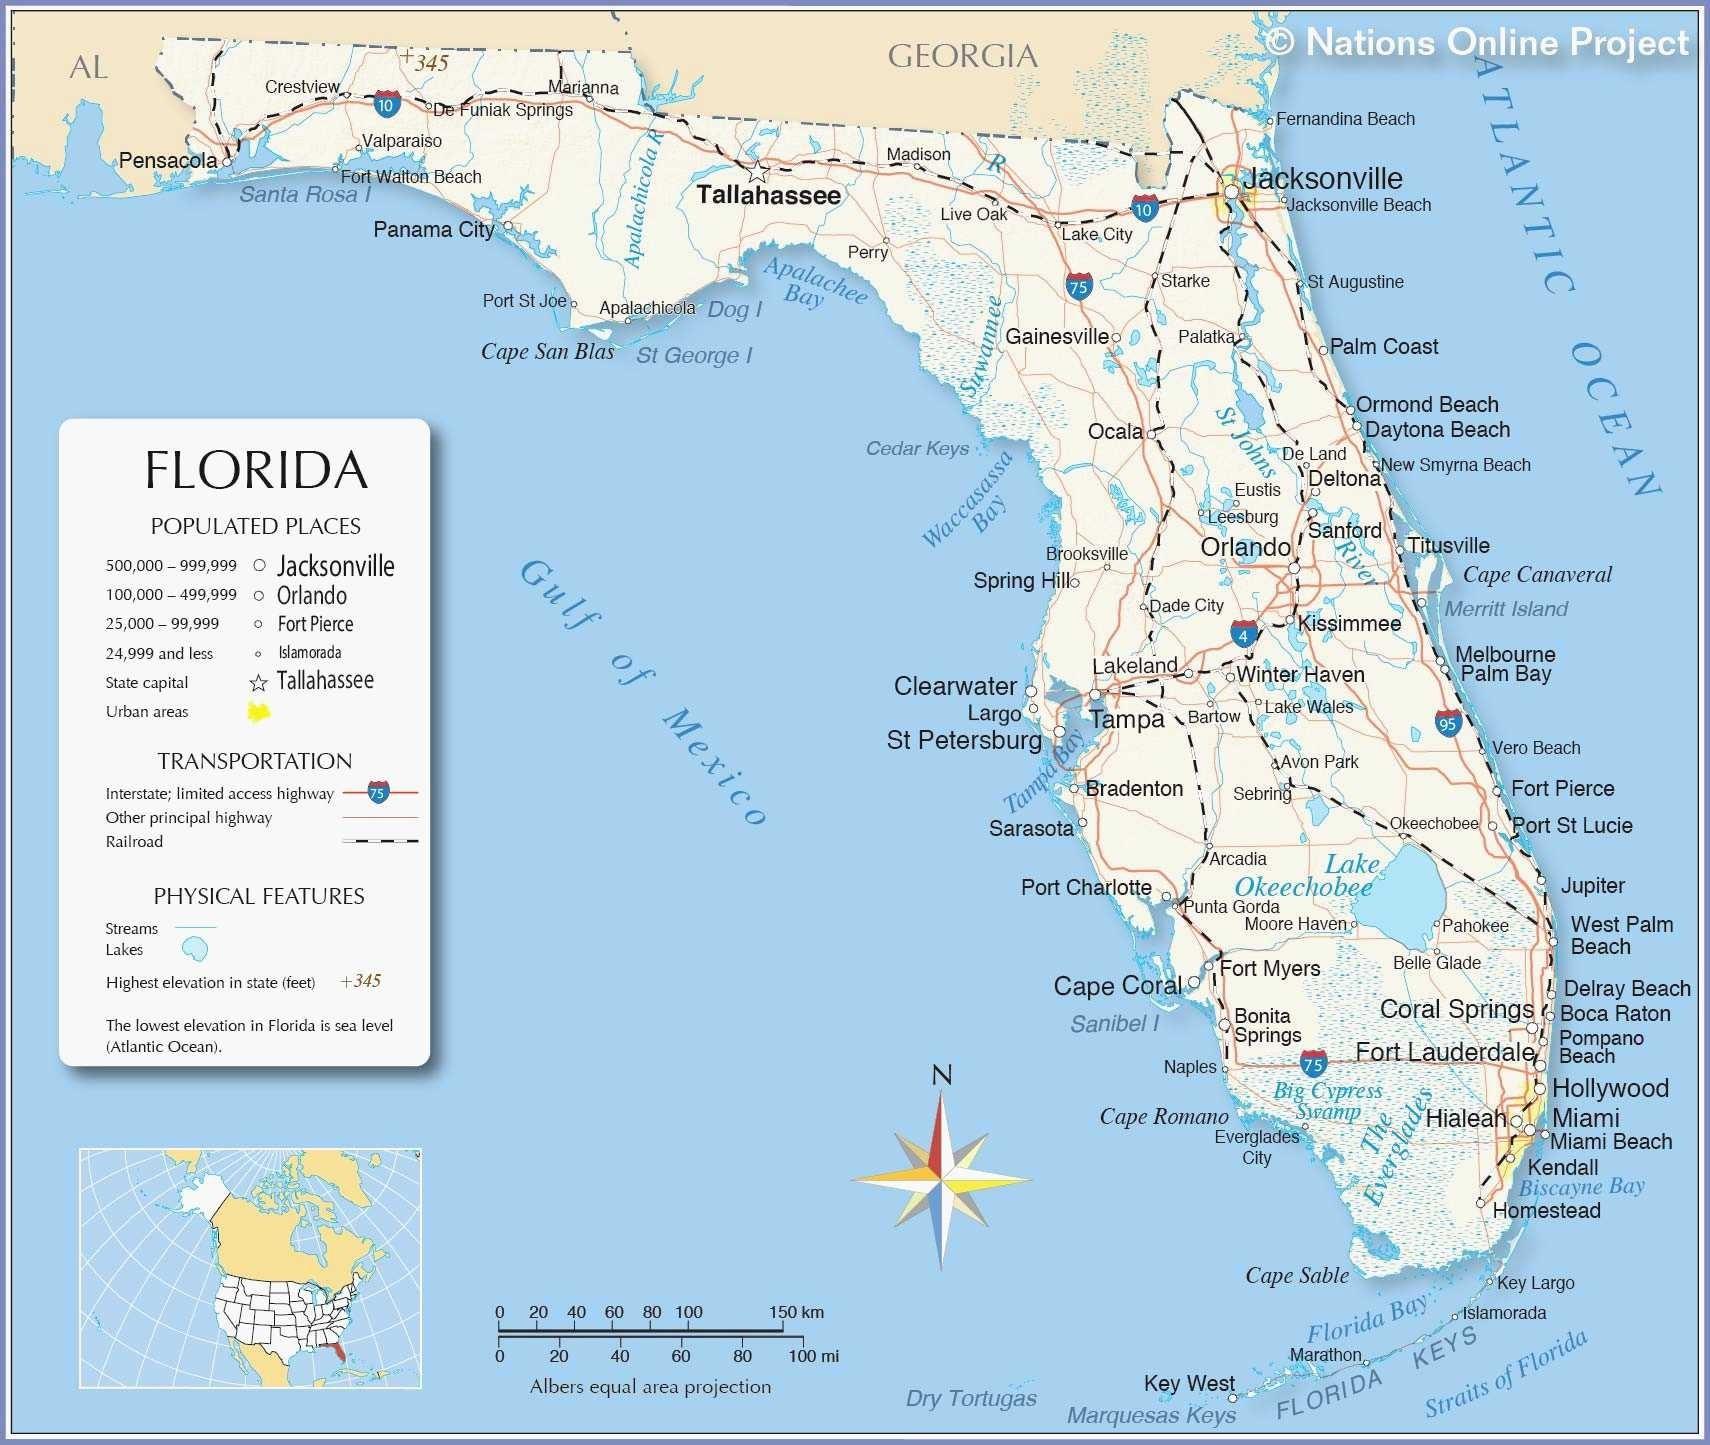 Us Geological Sinkhole Map Sinkhole Zones In Fl New United States - Florida Geological Survey Sinkhole Map